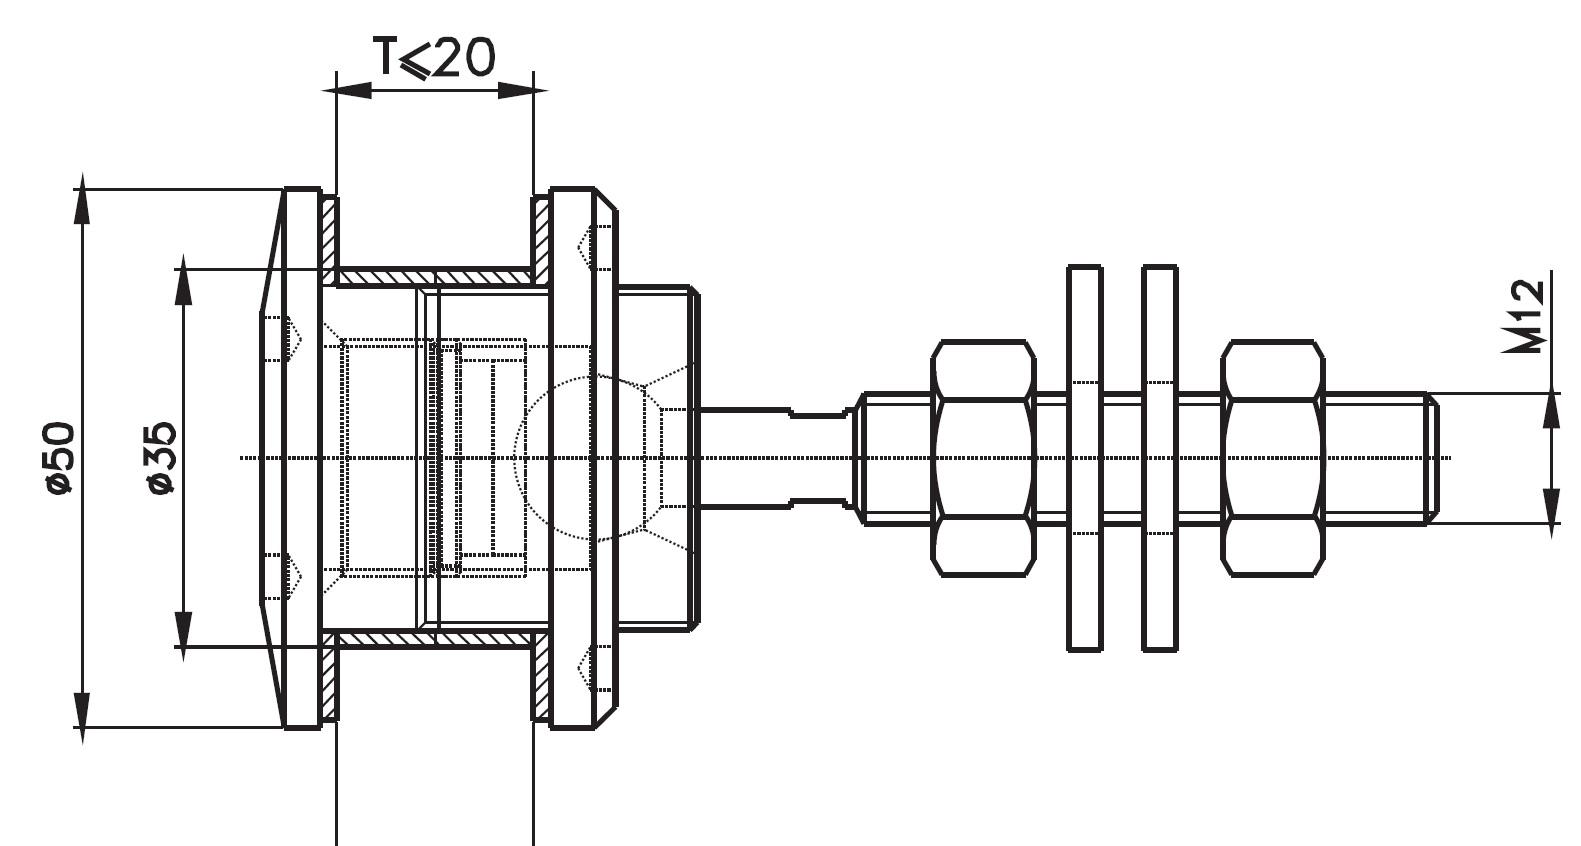 SPRO-50 / SPIDER ROTİL ÖNDEN SIKMALI Q50 Teknik Çizim